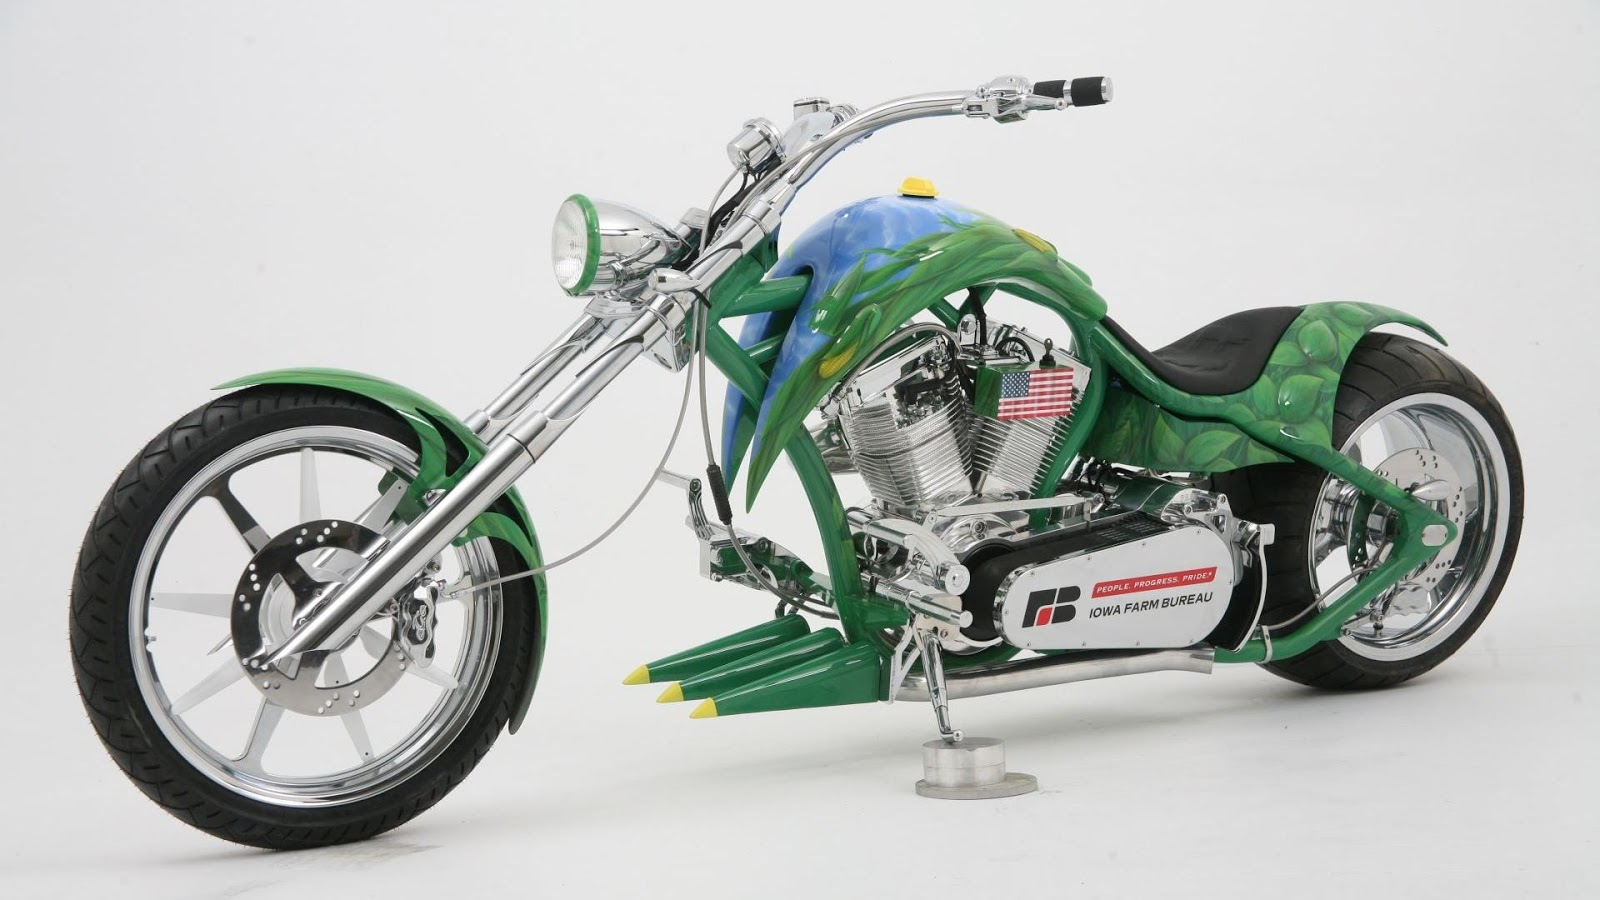 chopper motorcycles wallpaper - photo #33